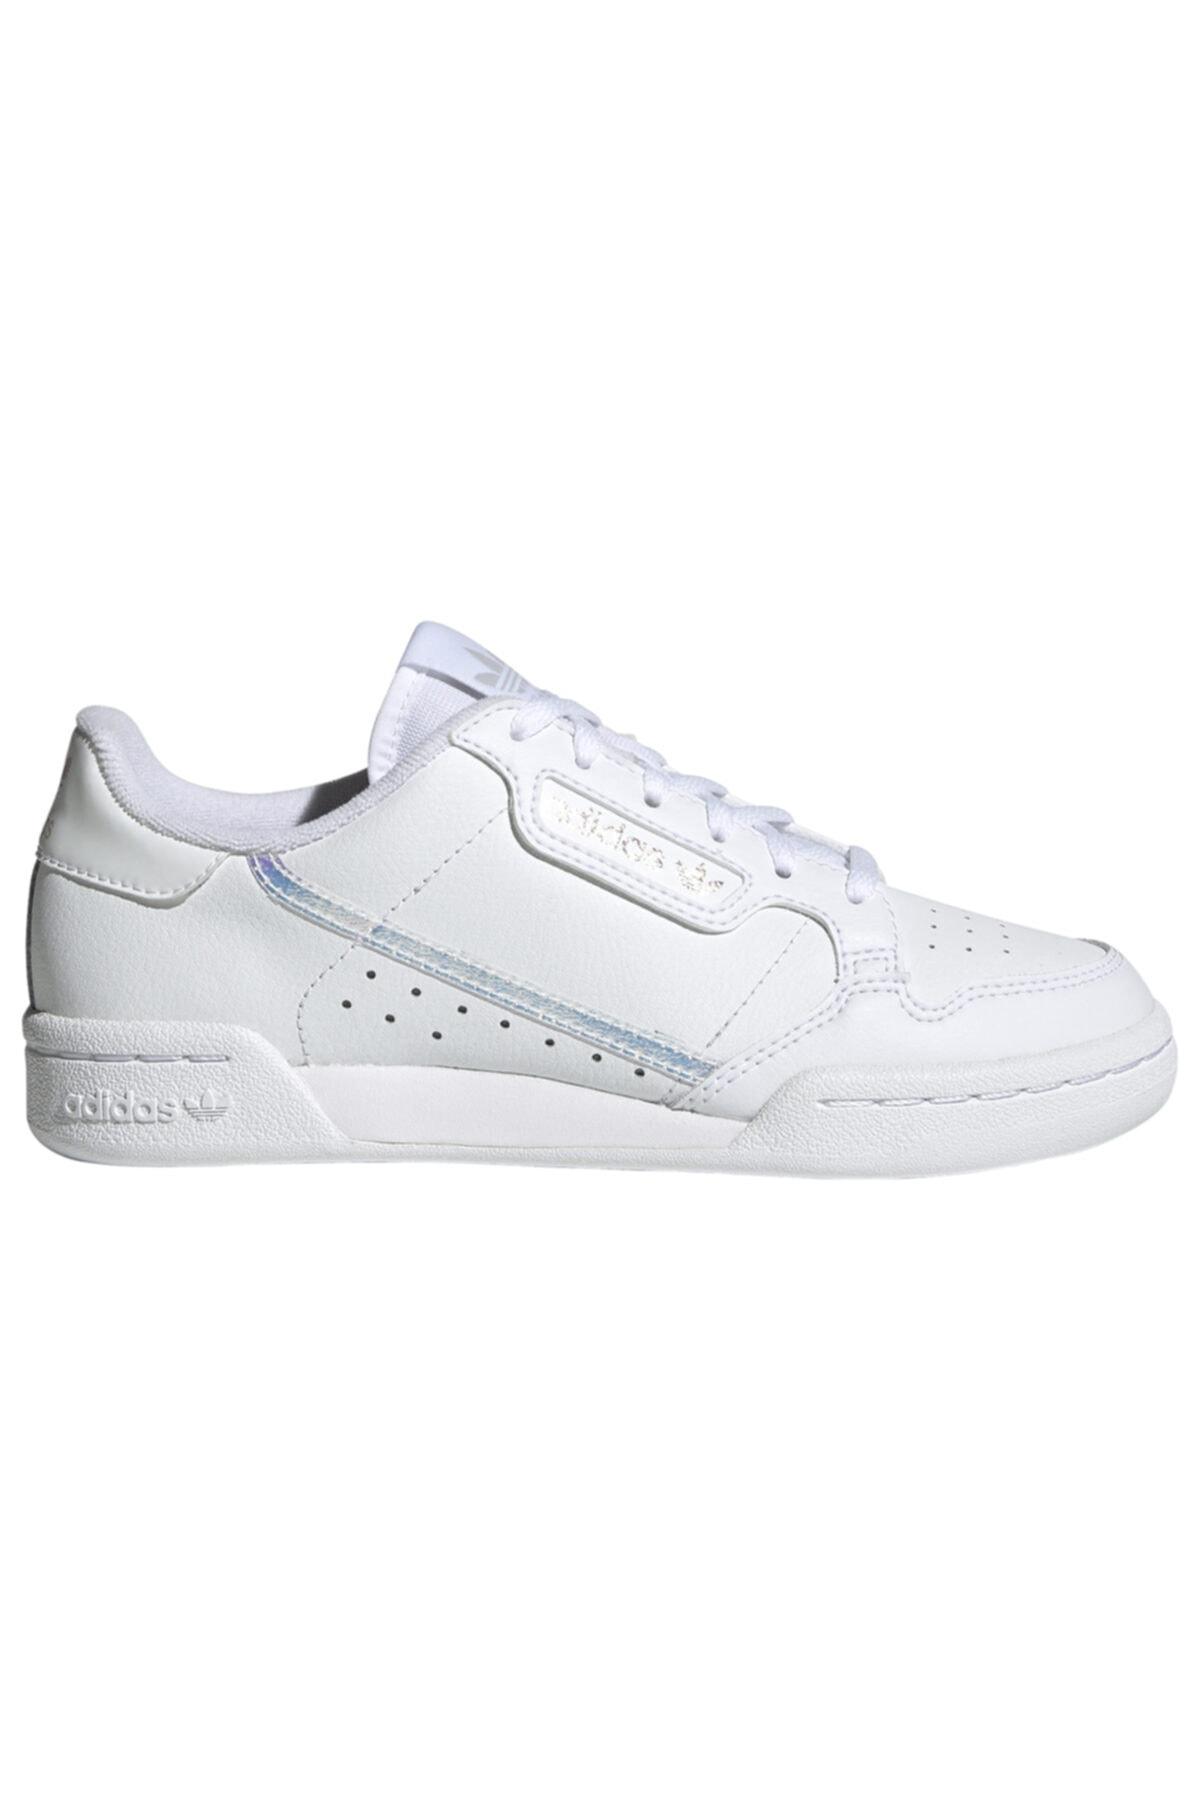 adidas Continental 80 Fw20 (GS) Spor Ayakkabı 1